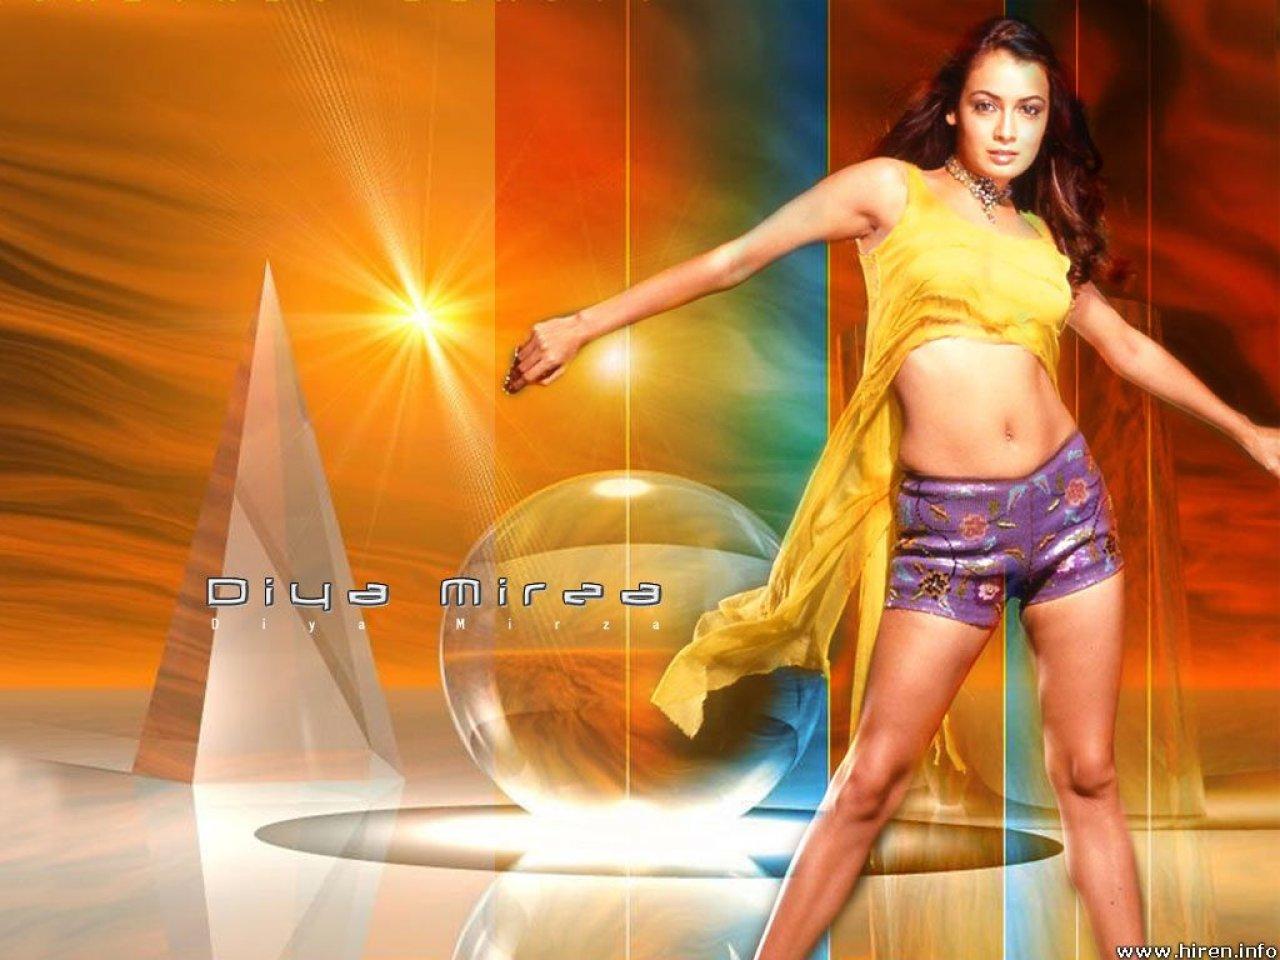 Pixwallpaper - Wallpaper Directory  Hot Wallpaper Of Bollywood Actress -3903